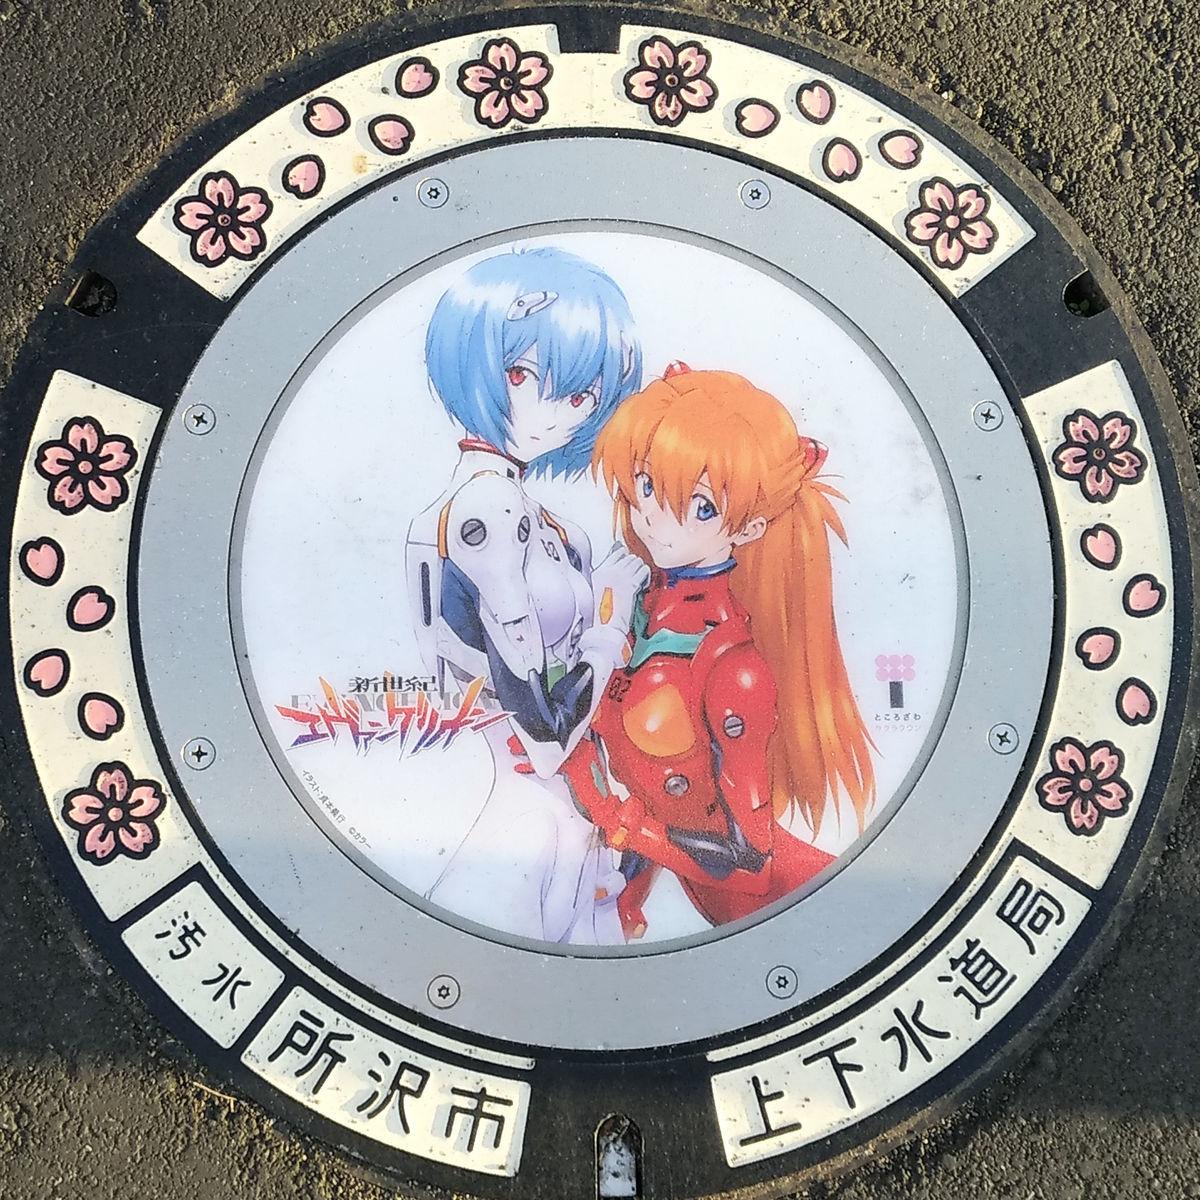 f:id:shinchu:20210117214335j:plain